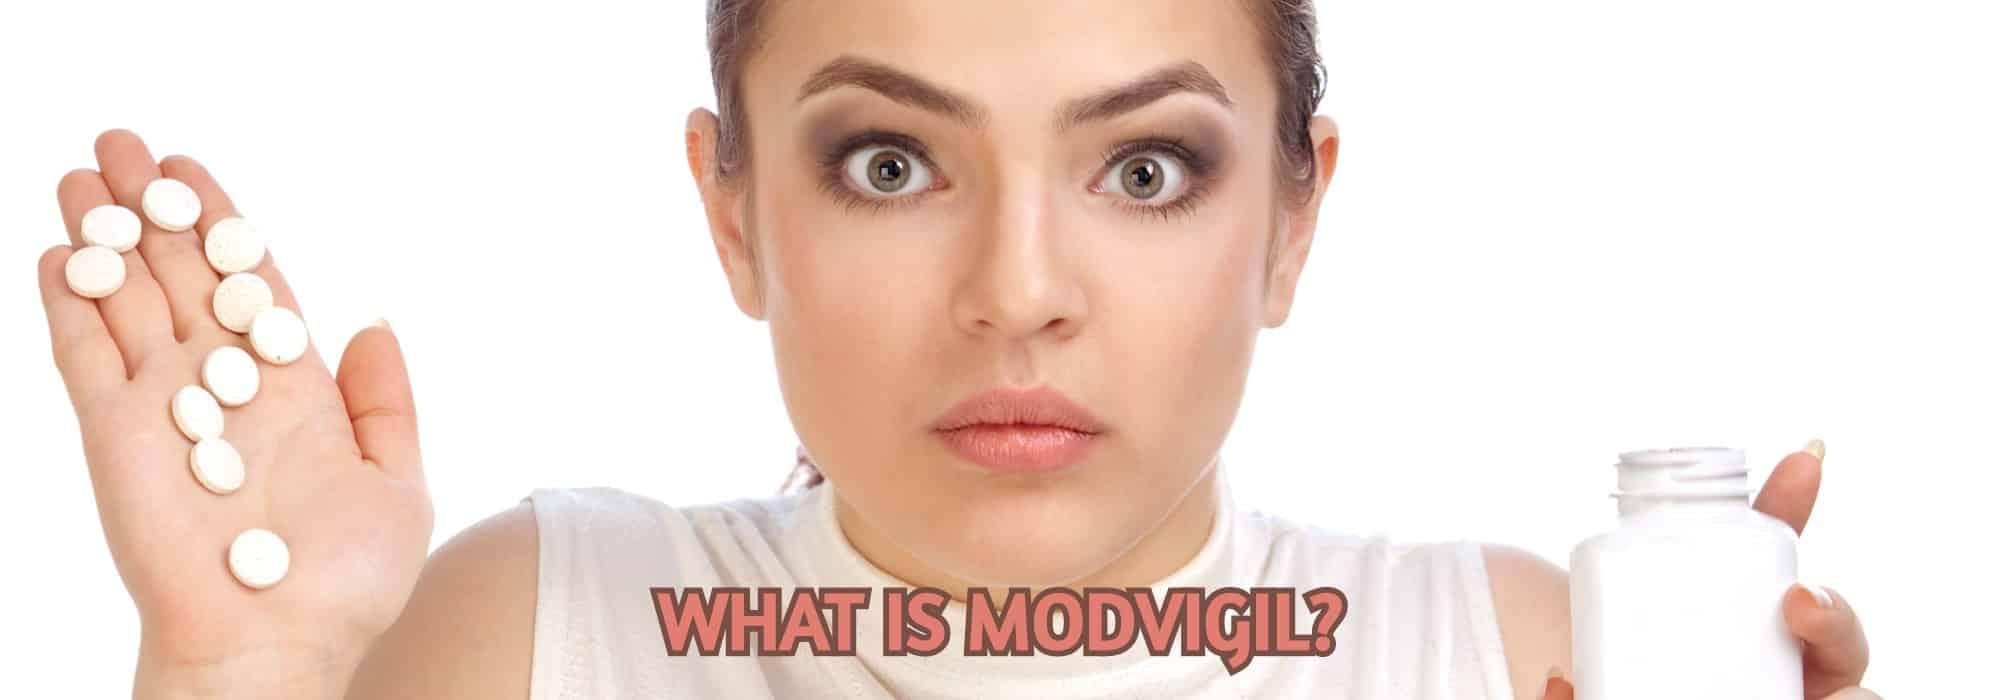 WHAT IS MODVIGIL